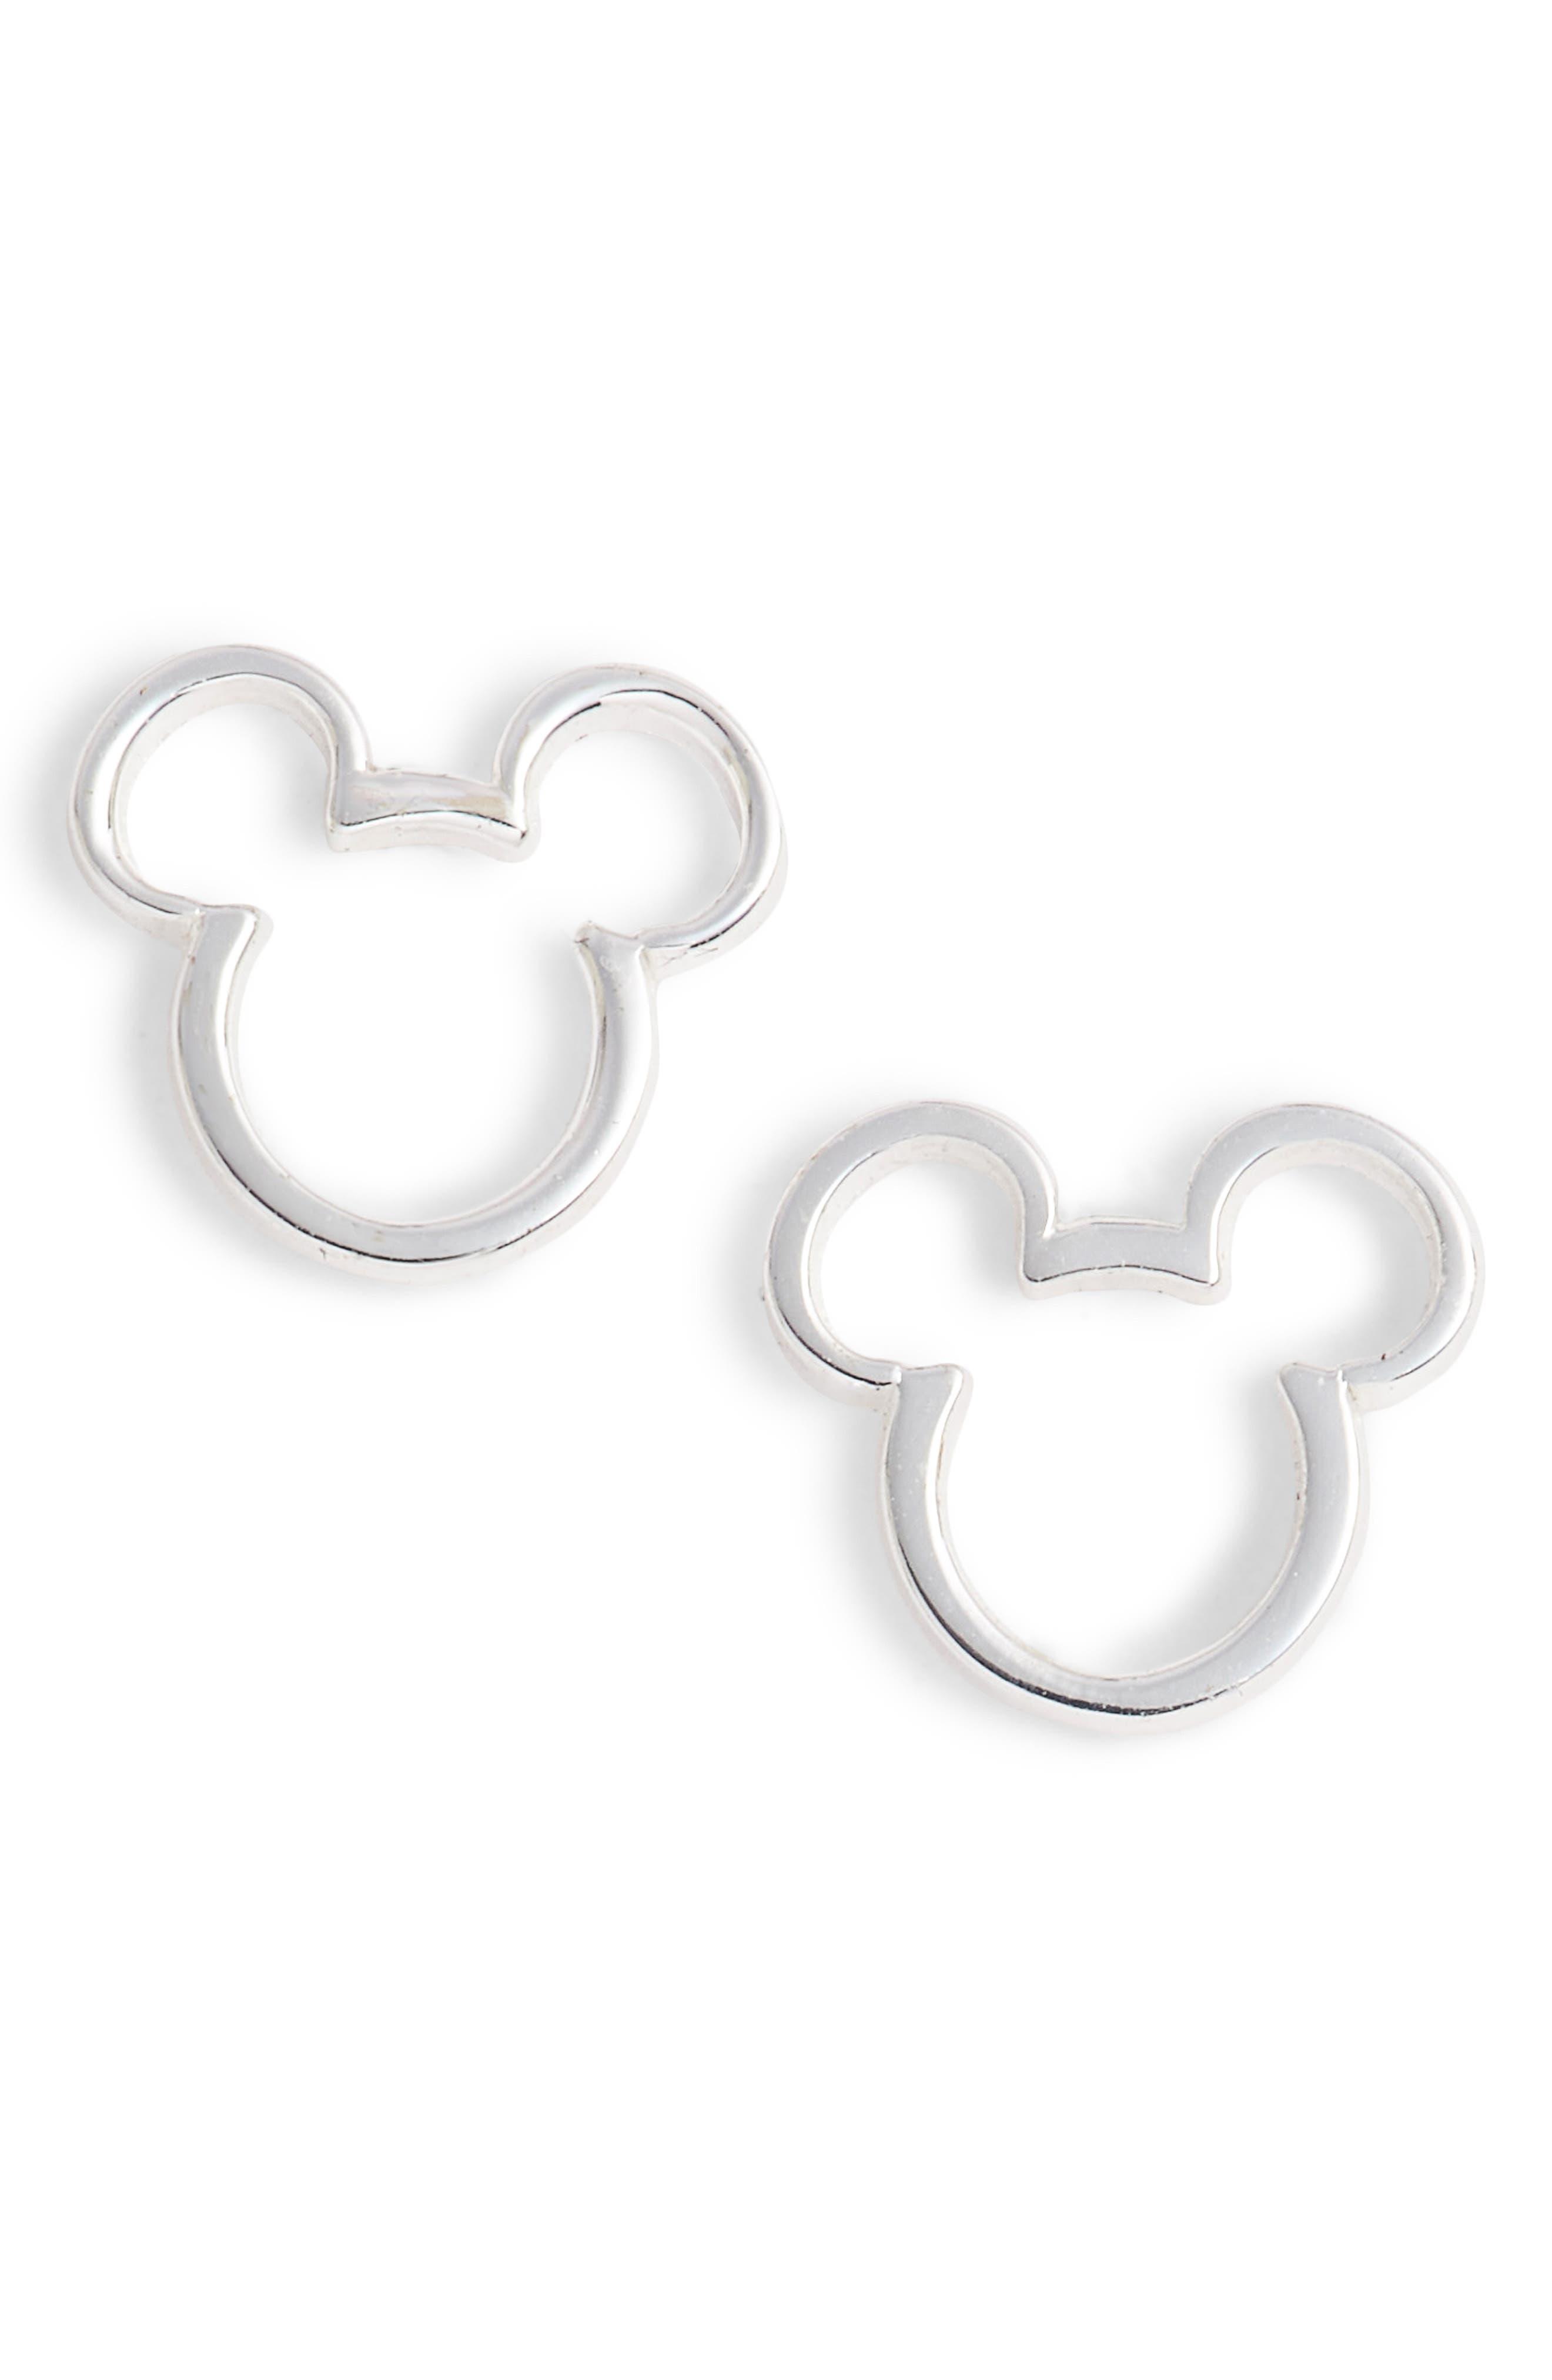 Mickey Mouse Stud Earrings,                             Main thumbnail 1, color,                             Silver